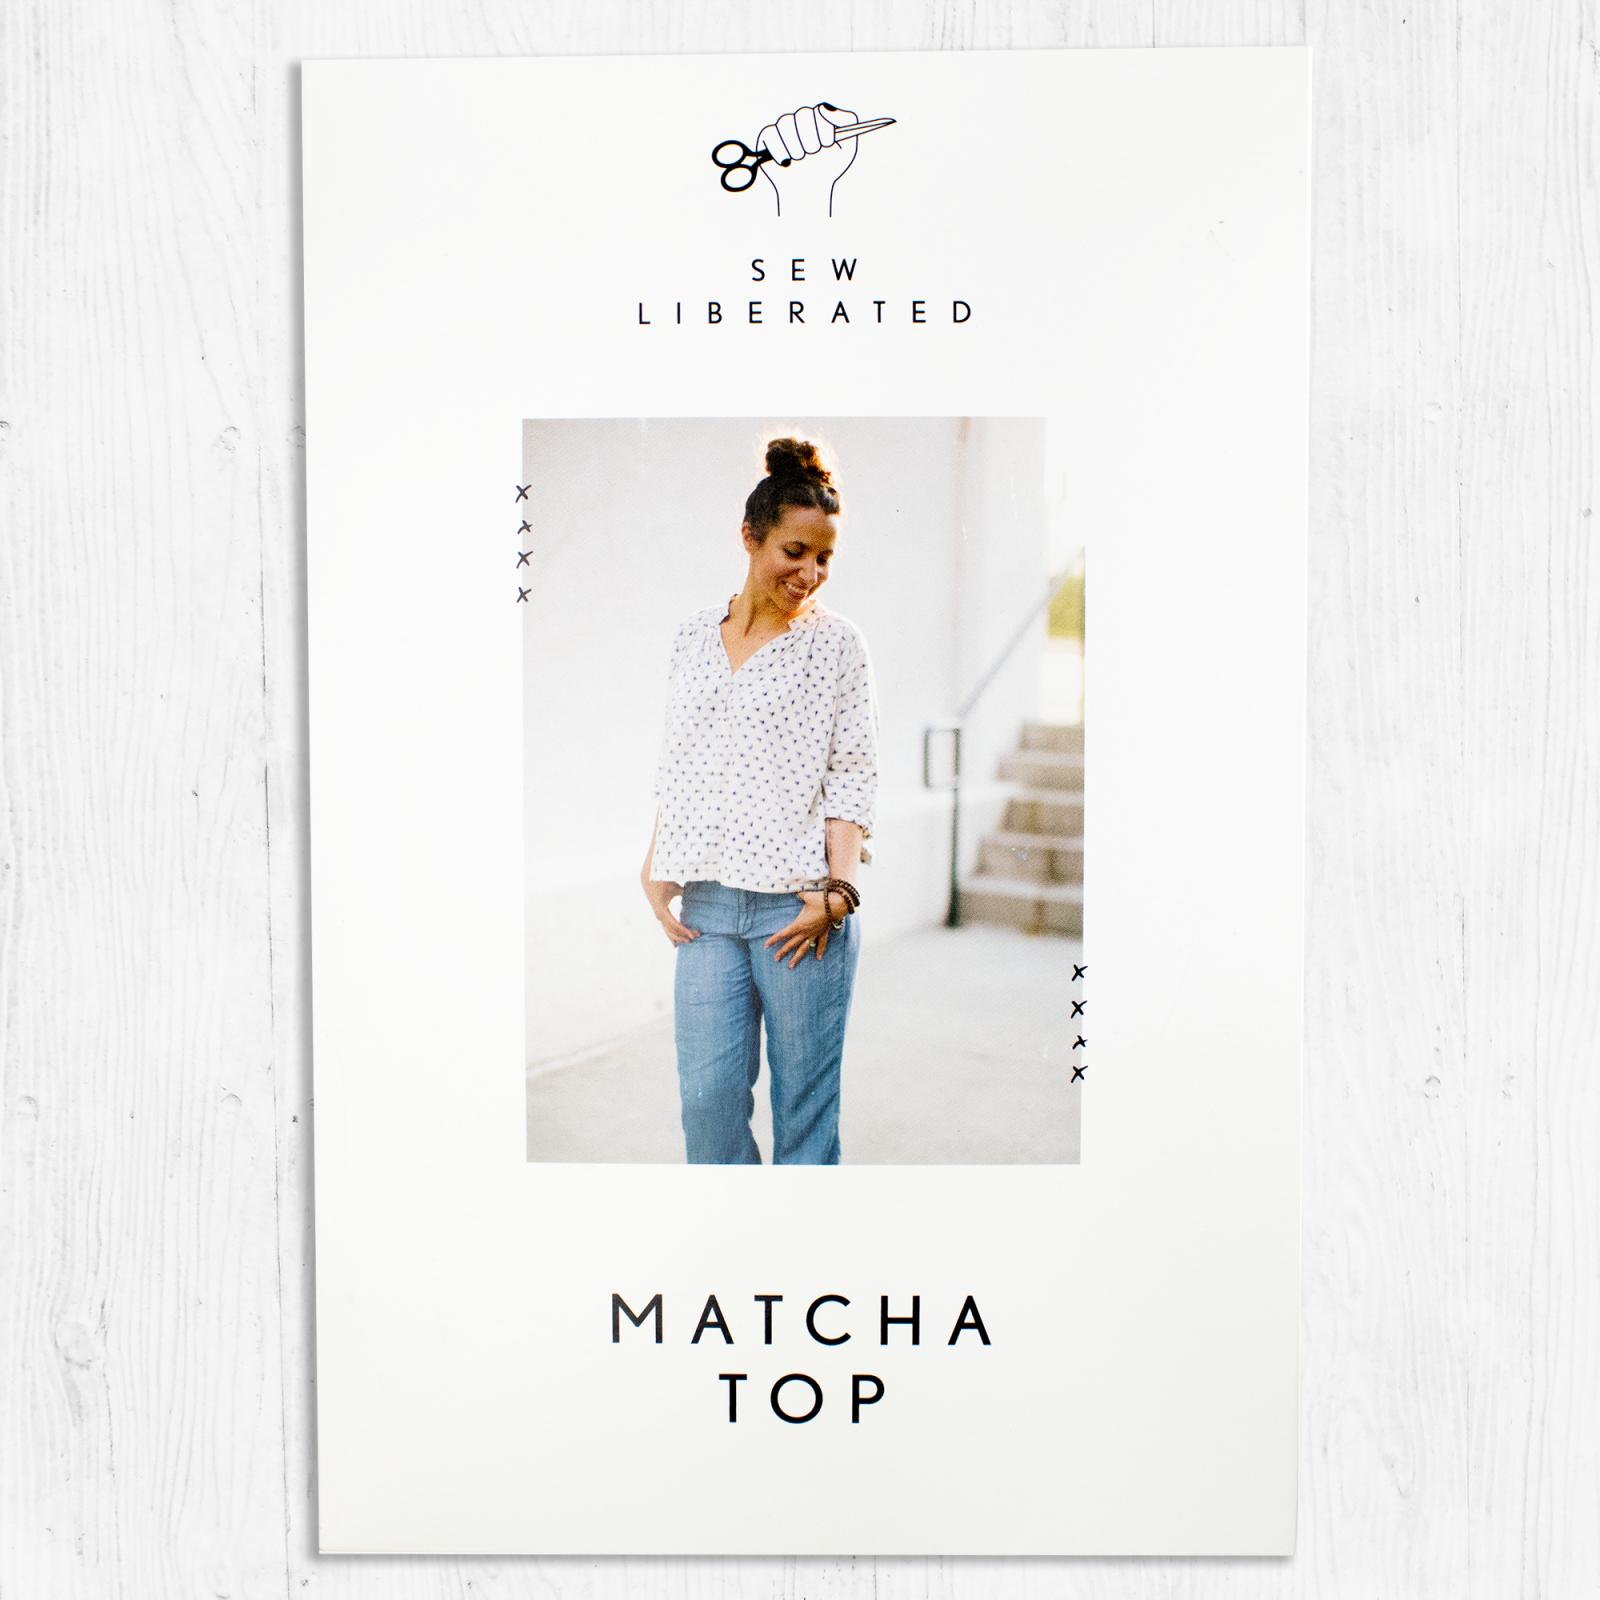 Sew Liberated - Matcha Top